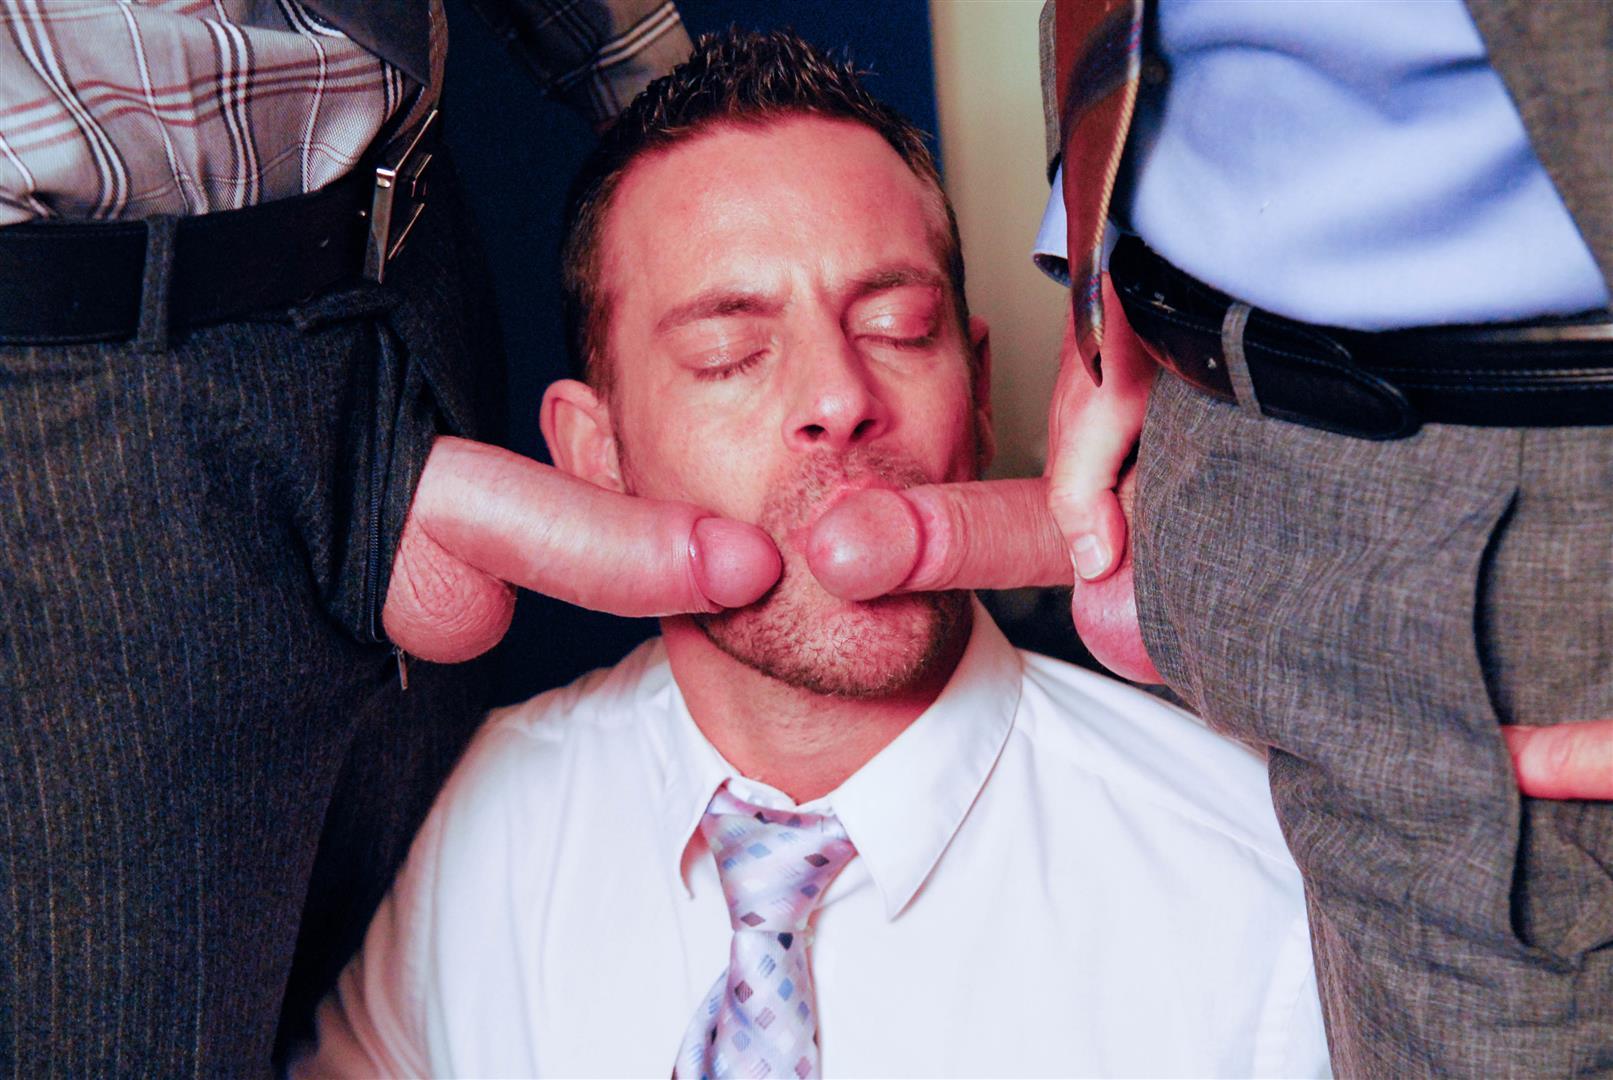 порно мужчин в офисе